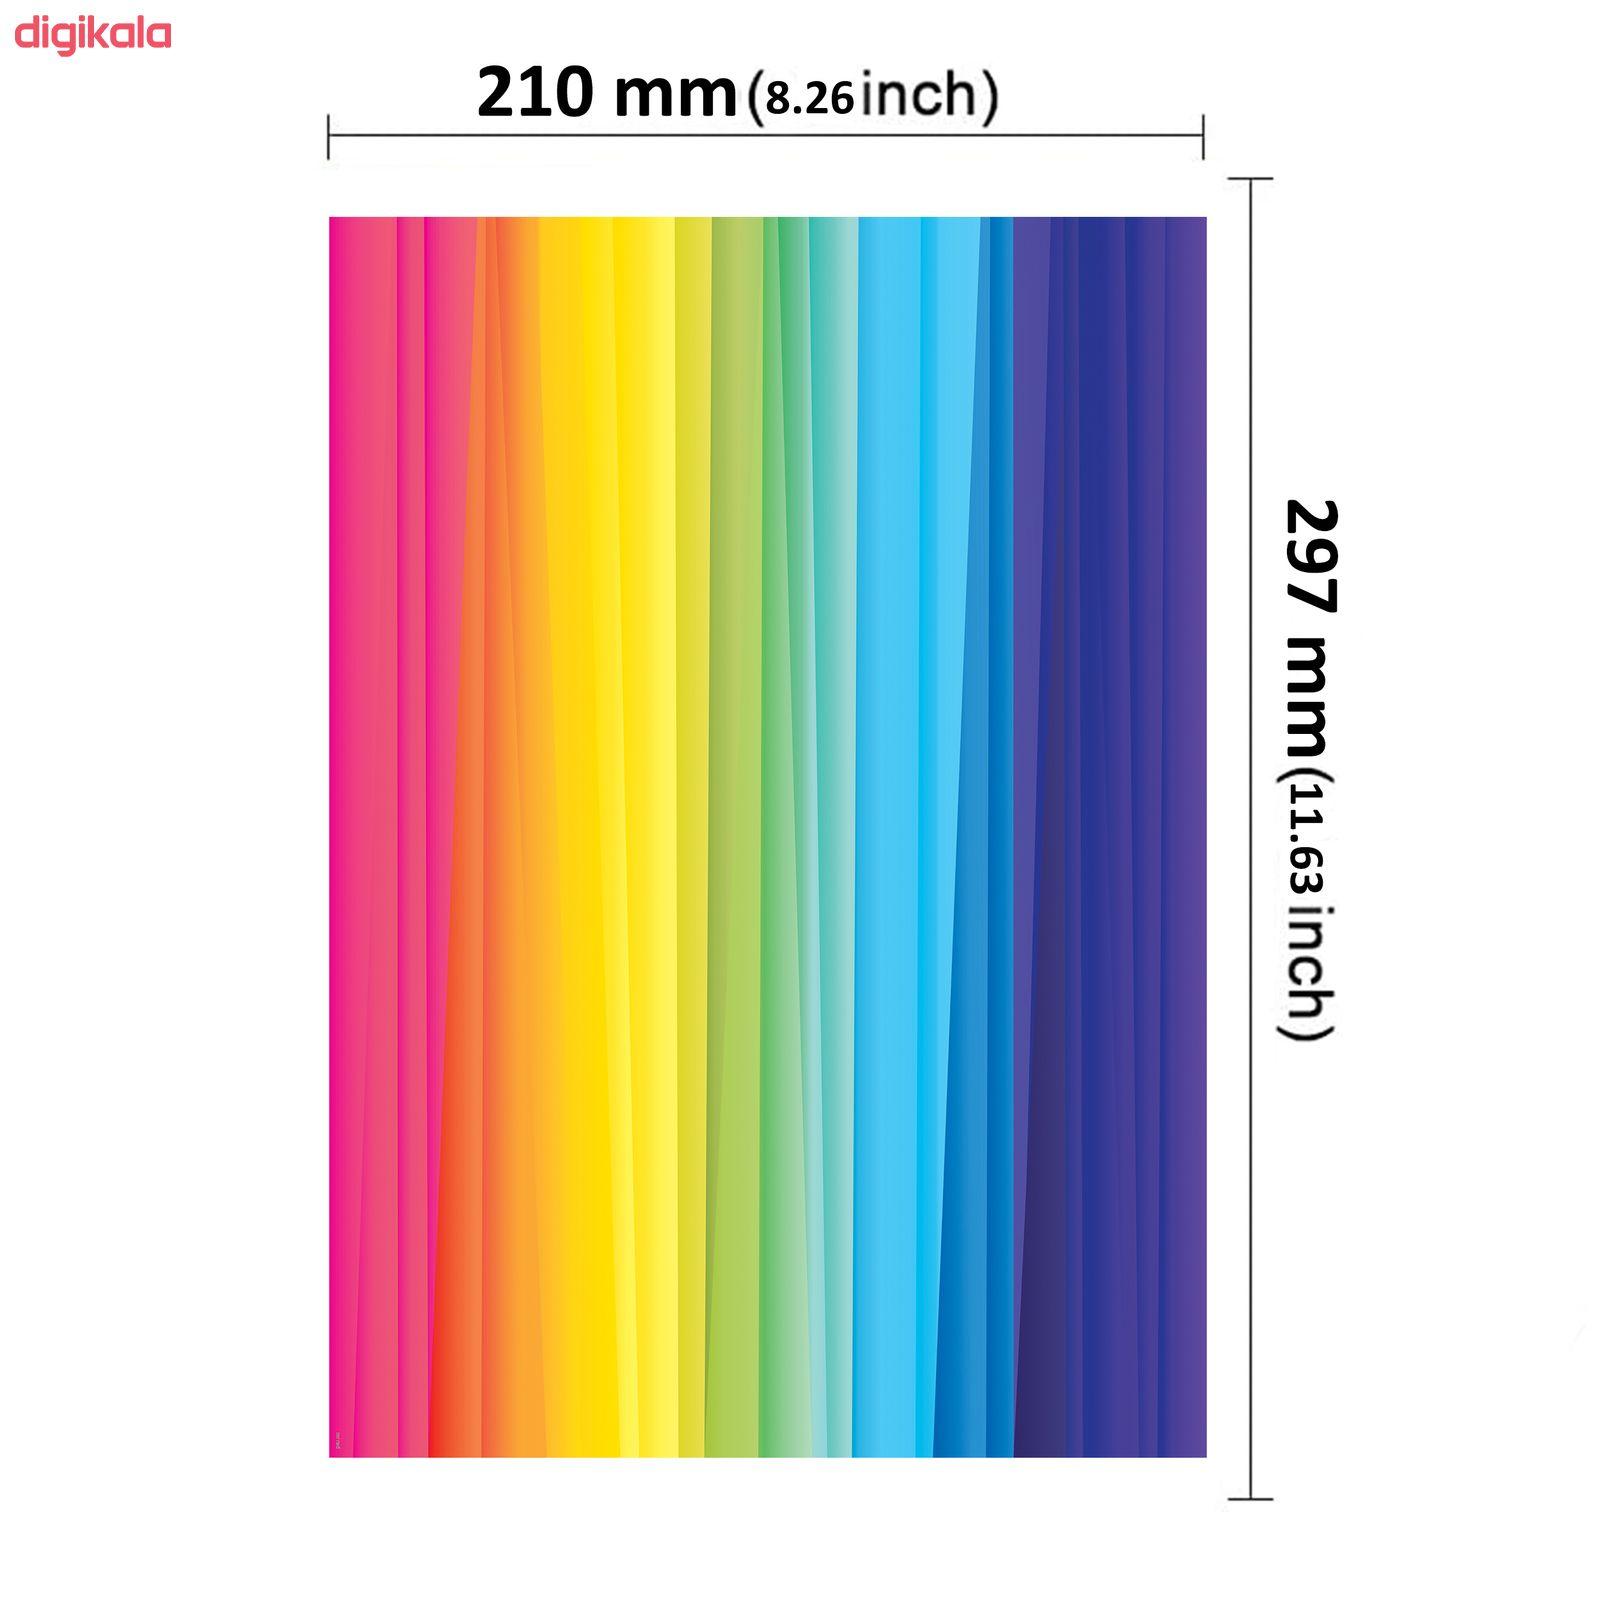 کاغذ رنگی A4 مستر راد مدل رنگارنگ بسته 10 عددی main 1 2